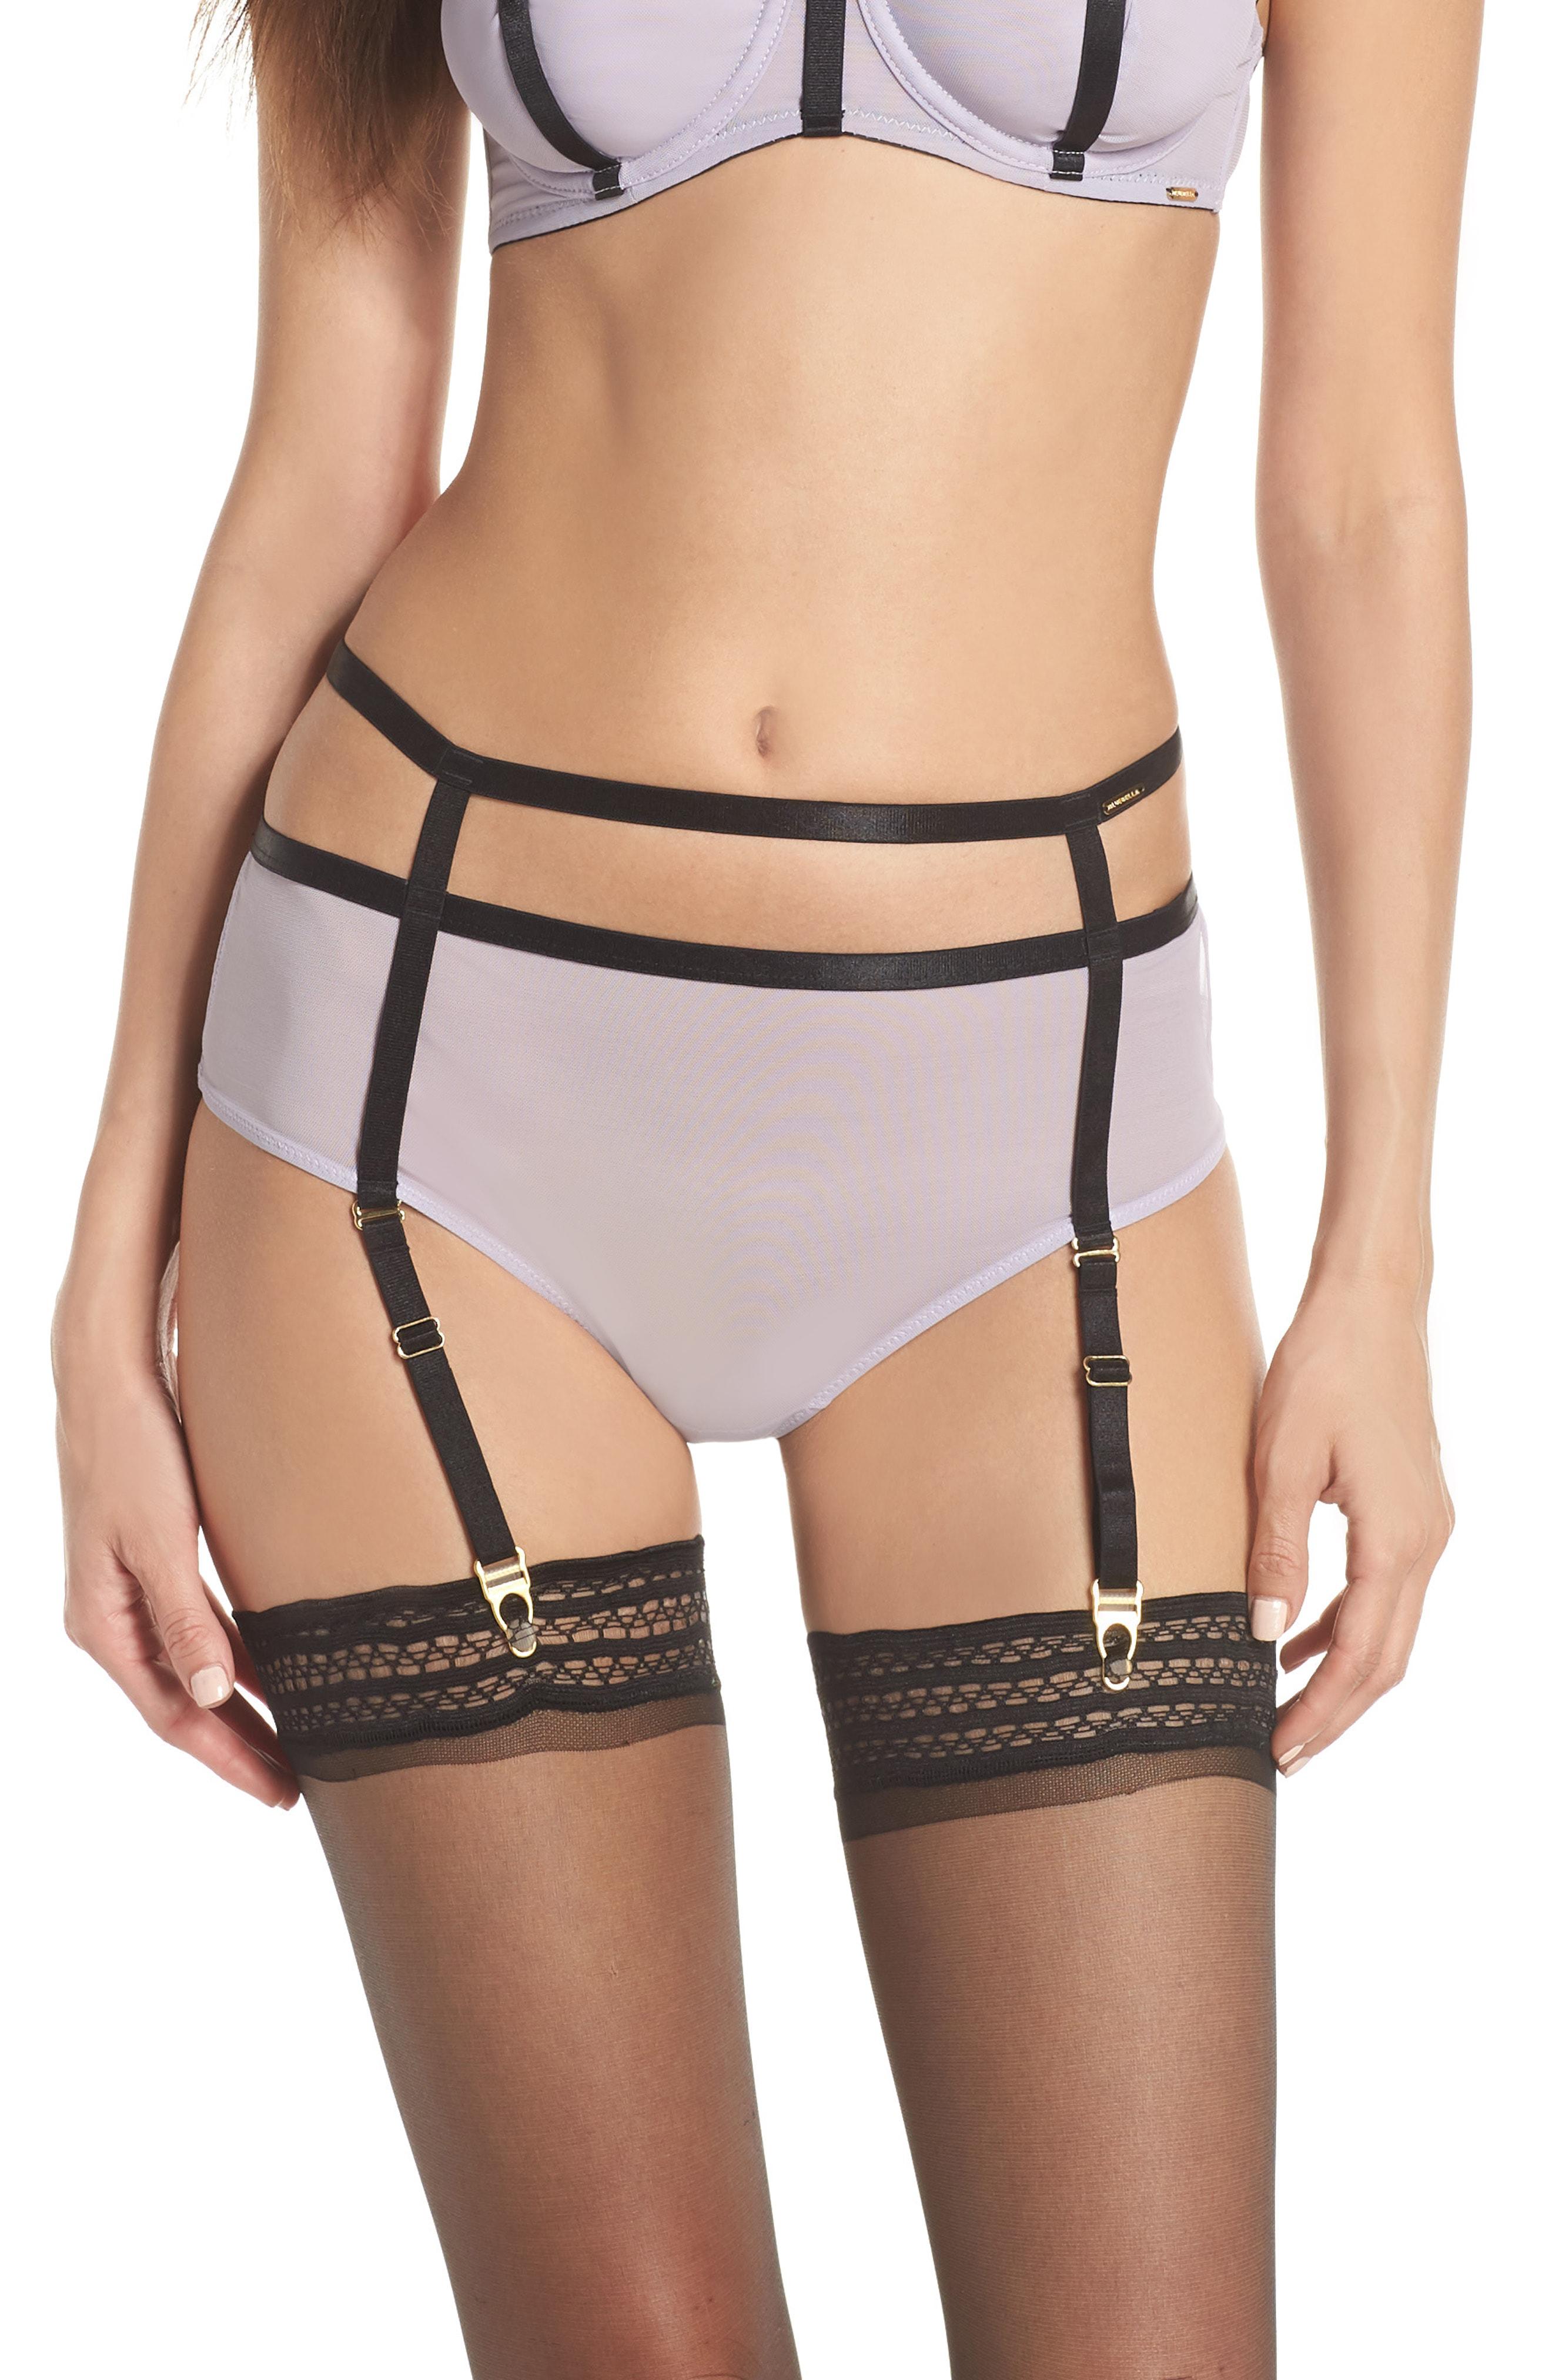 cf5fb97439b Bluebella Denham Garter Thong In Lilac  Black